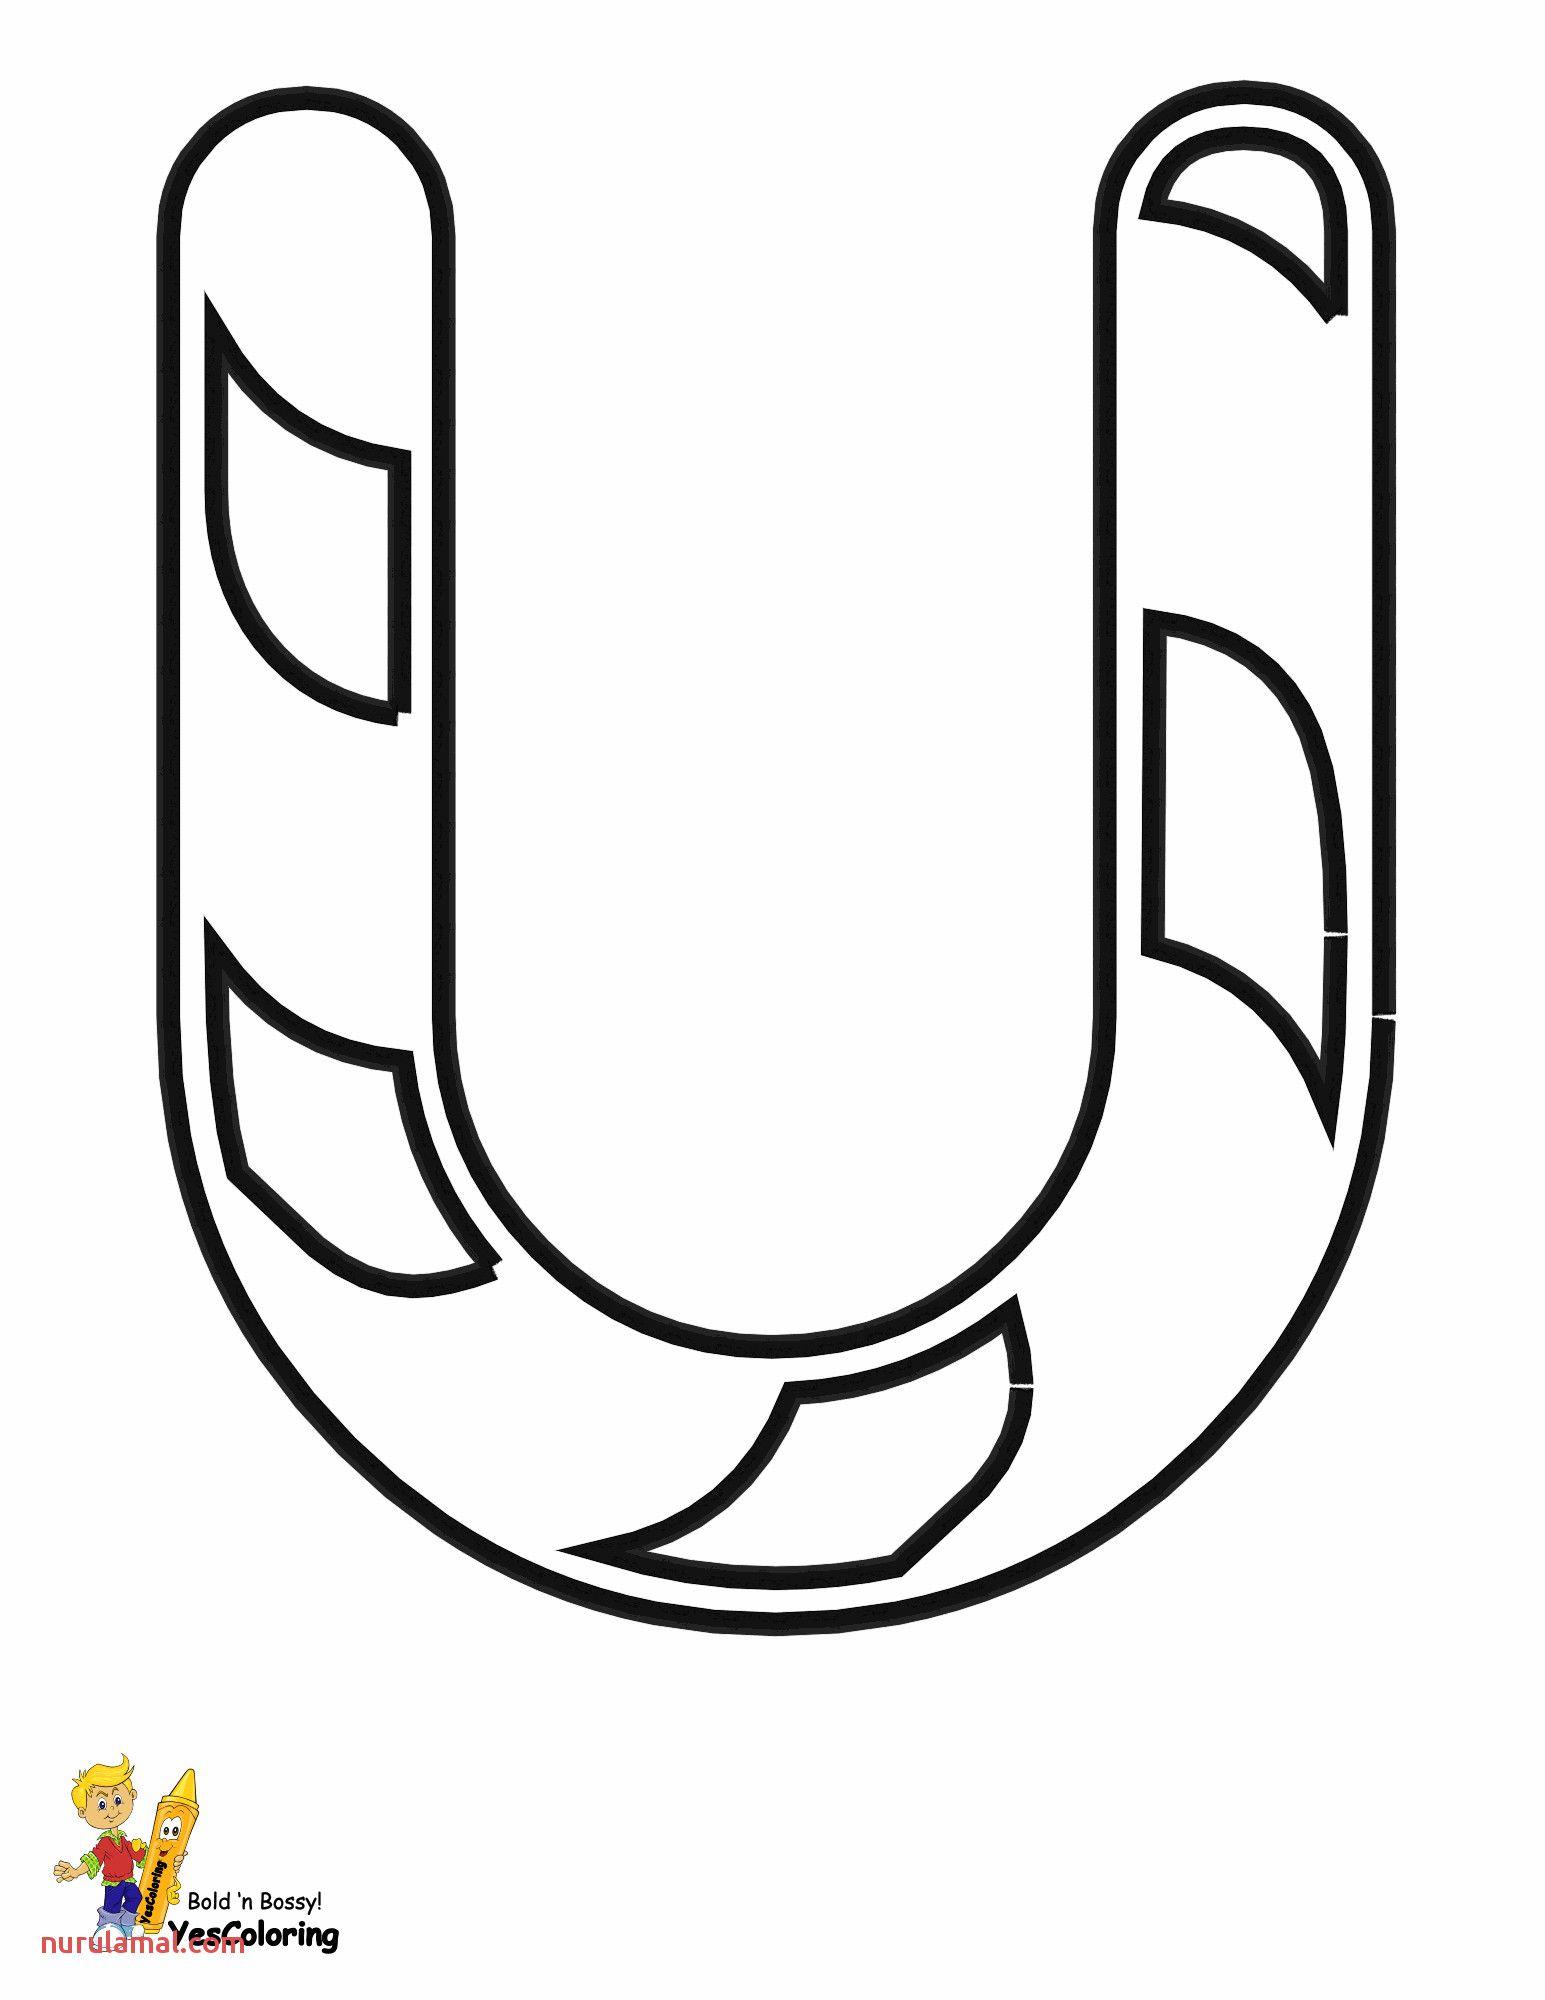 Letter T Coloring Worksheet Printable In 2020 Alphabet Coloring Pages Alphabet Coloring Coloring Pages Inspirational [ 2000 x 1545 Pixel ]